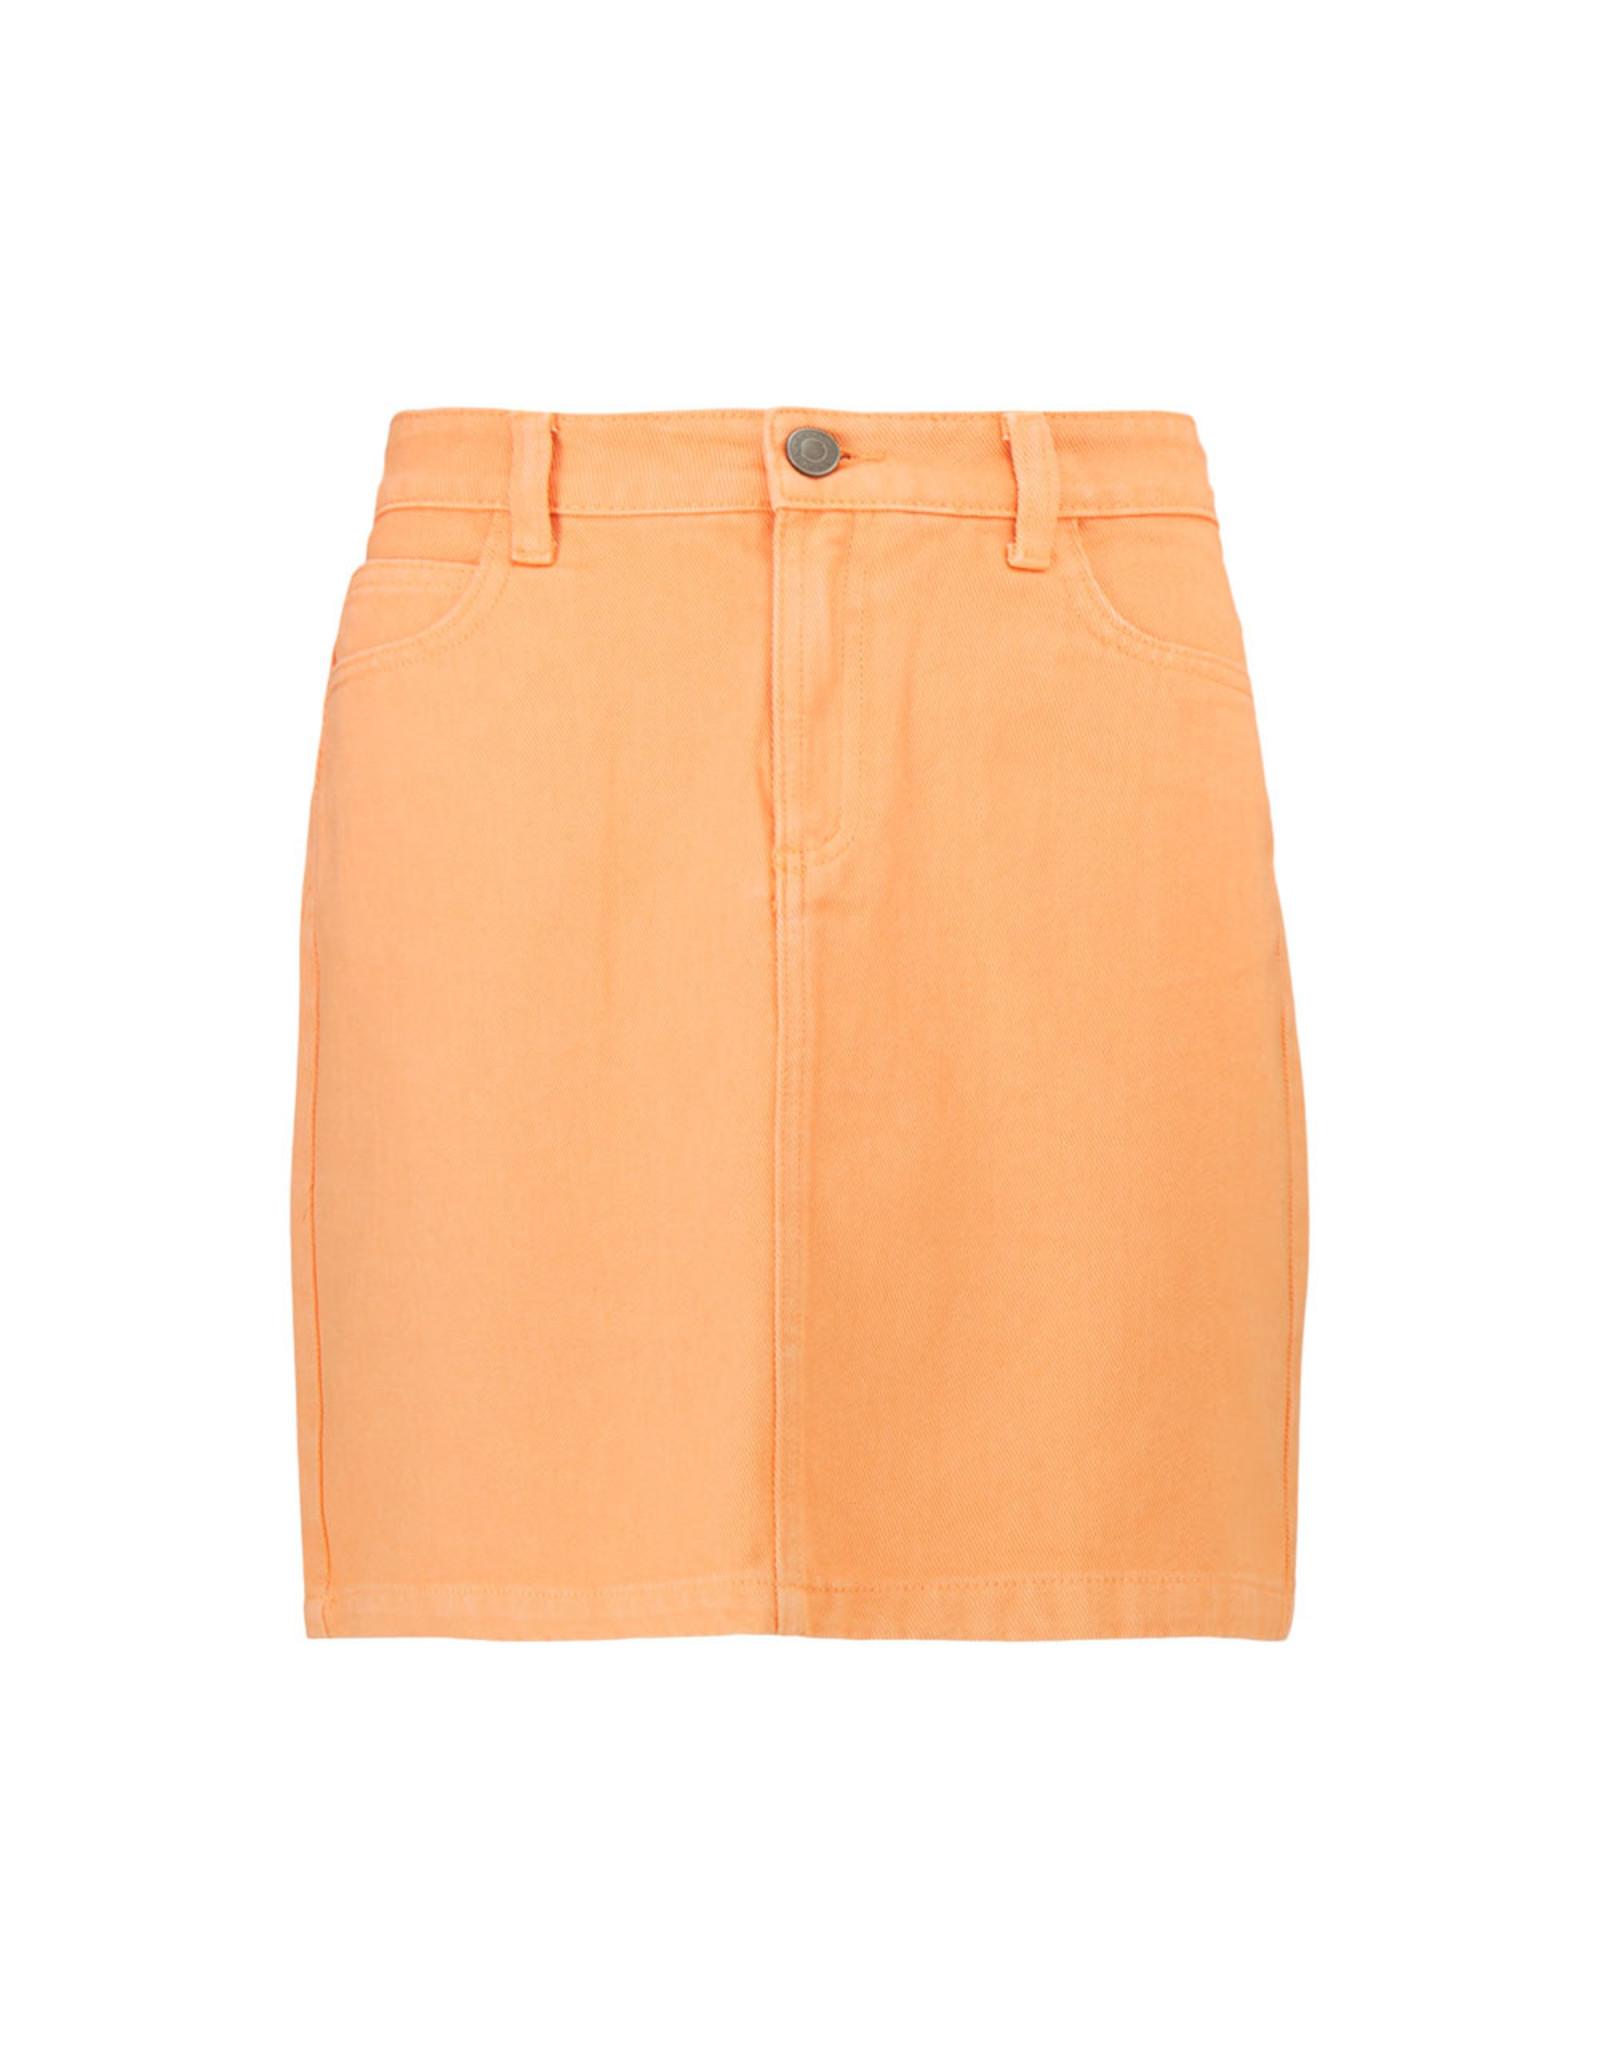 Modstrom Ilias Skirt Apricot Cream